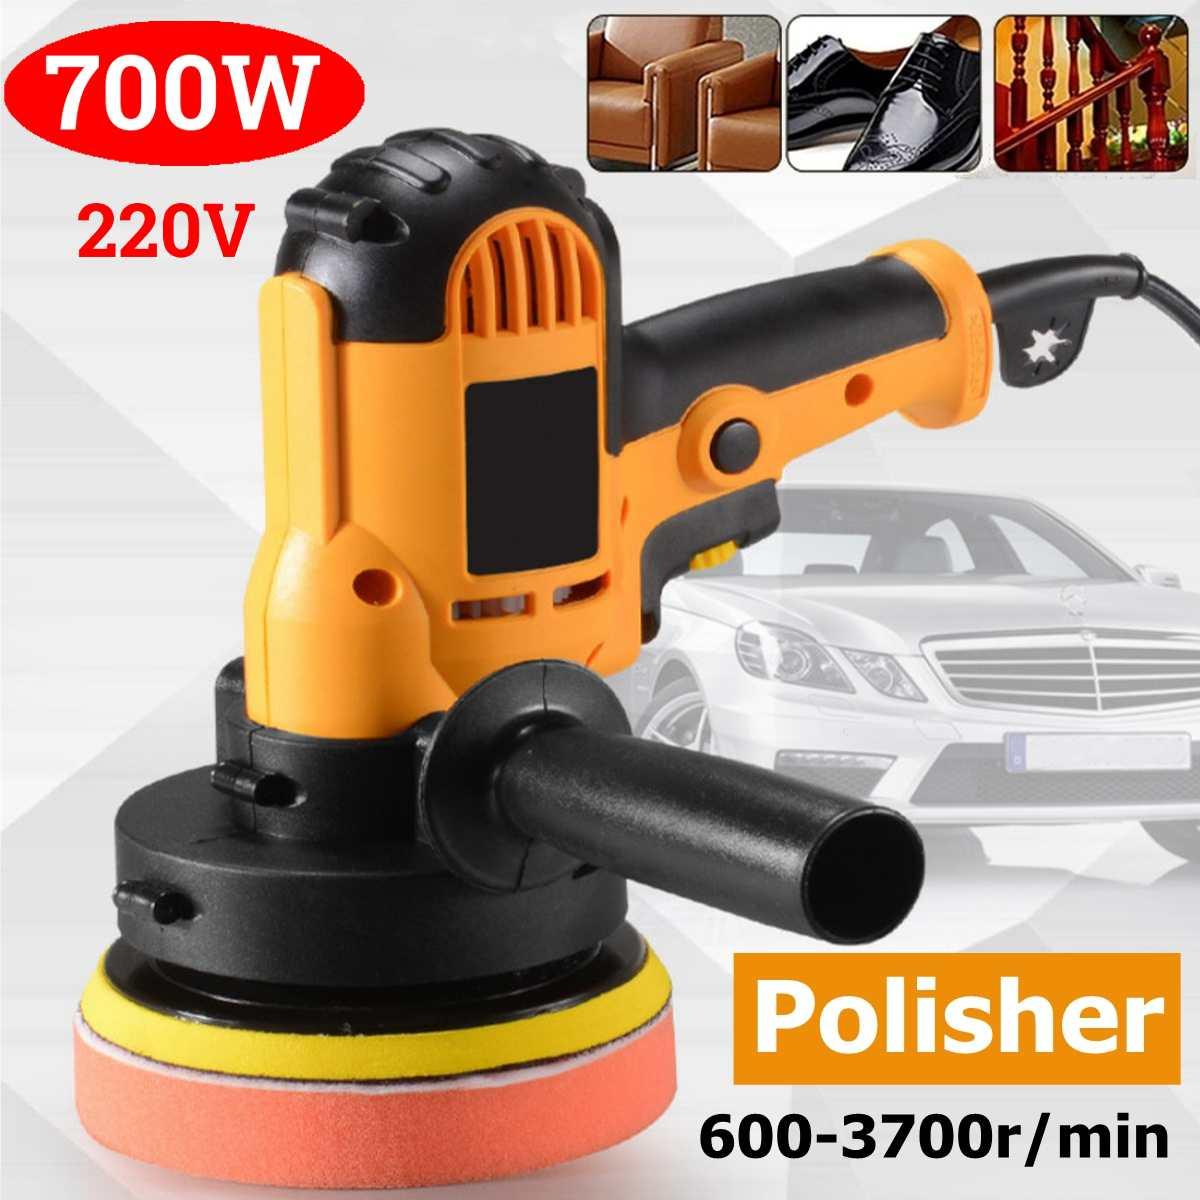 700w Buffer Polisher Machine Electric Car Polisher Waxer Variable Speeds Tool Household Waxing Polishing Machine|Polishers| |  - title=